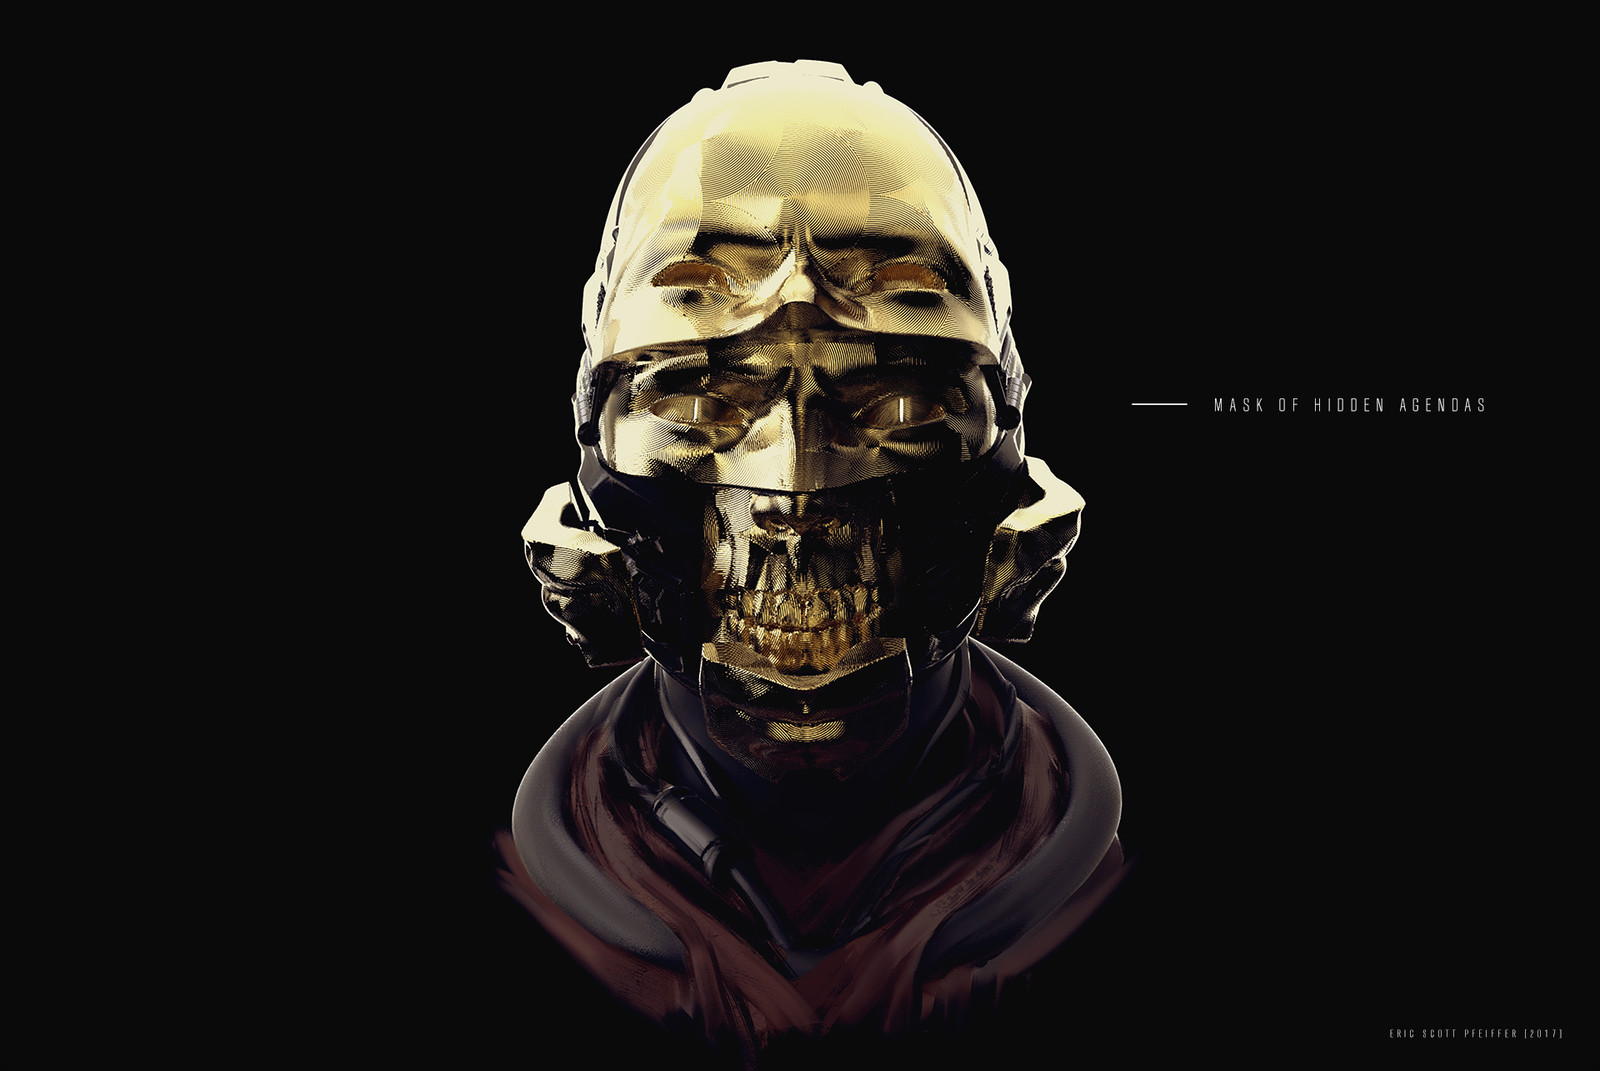 Mask of Hidden Agendas Concept